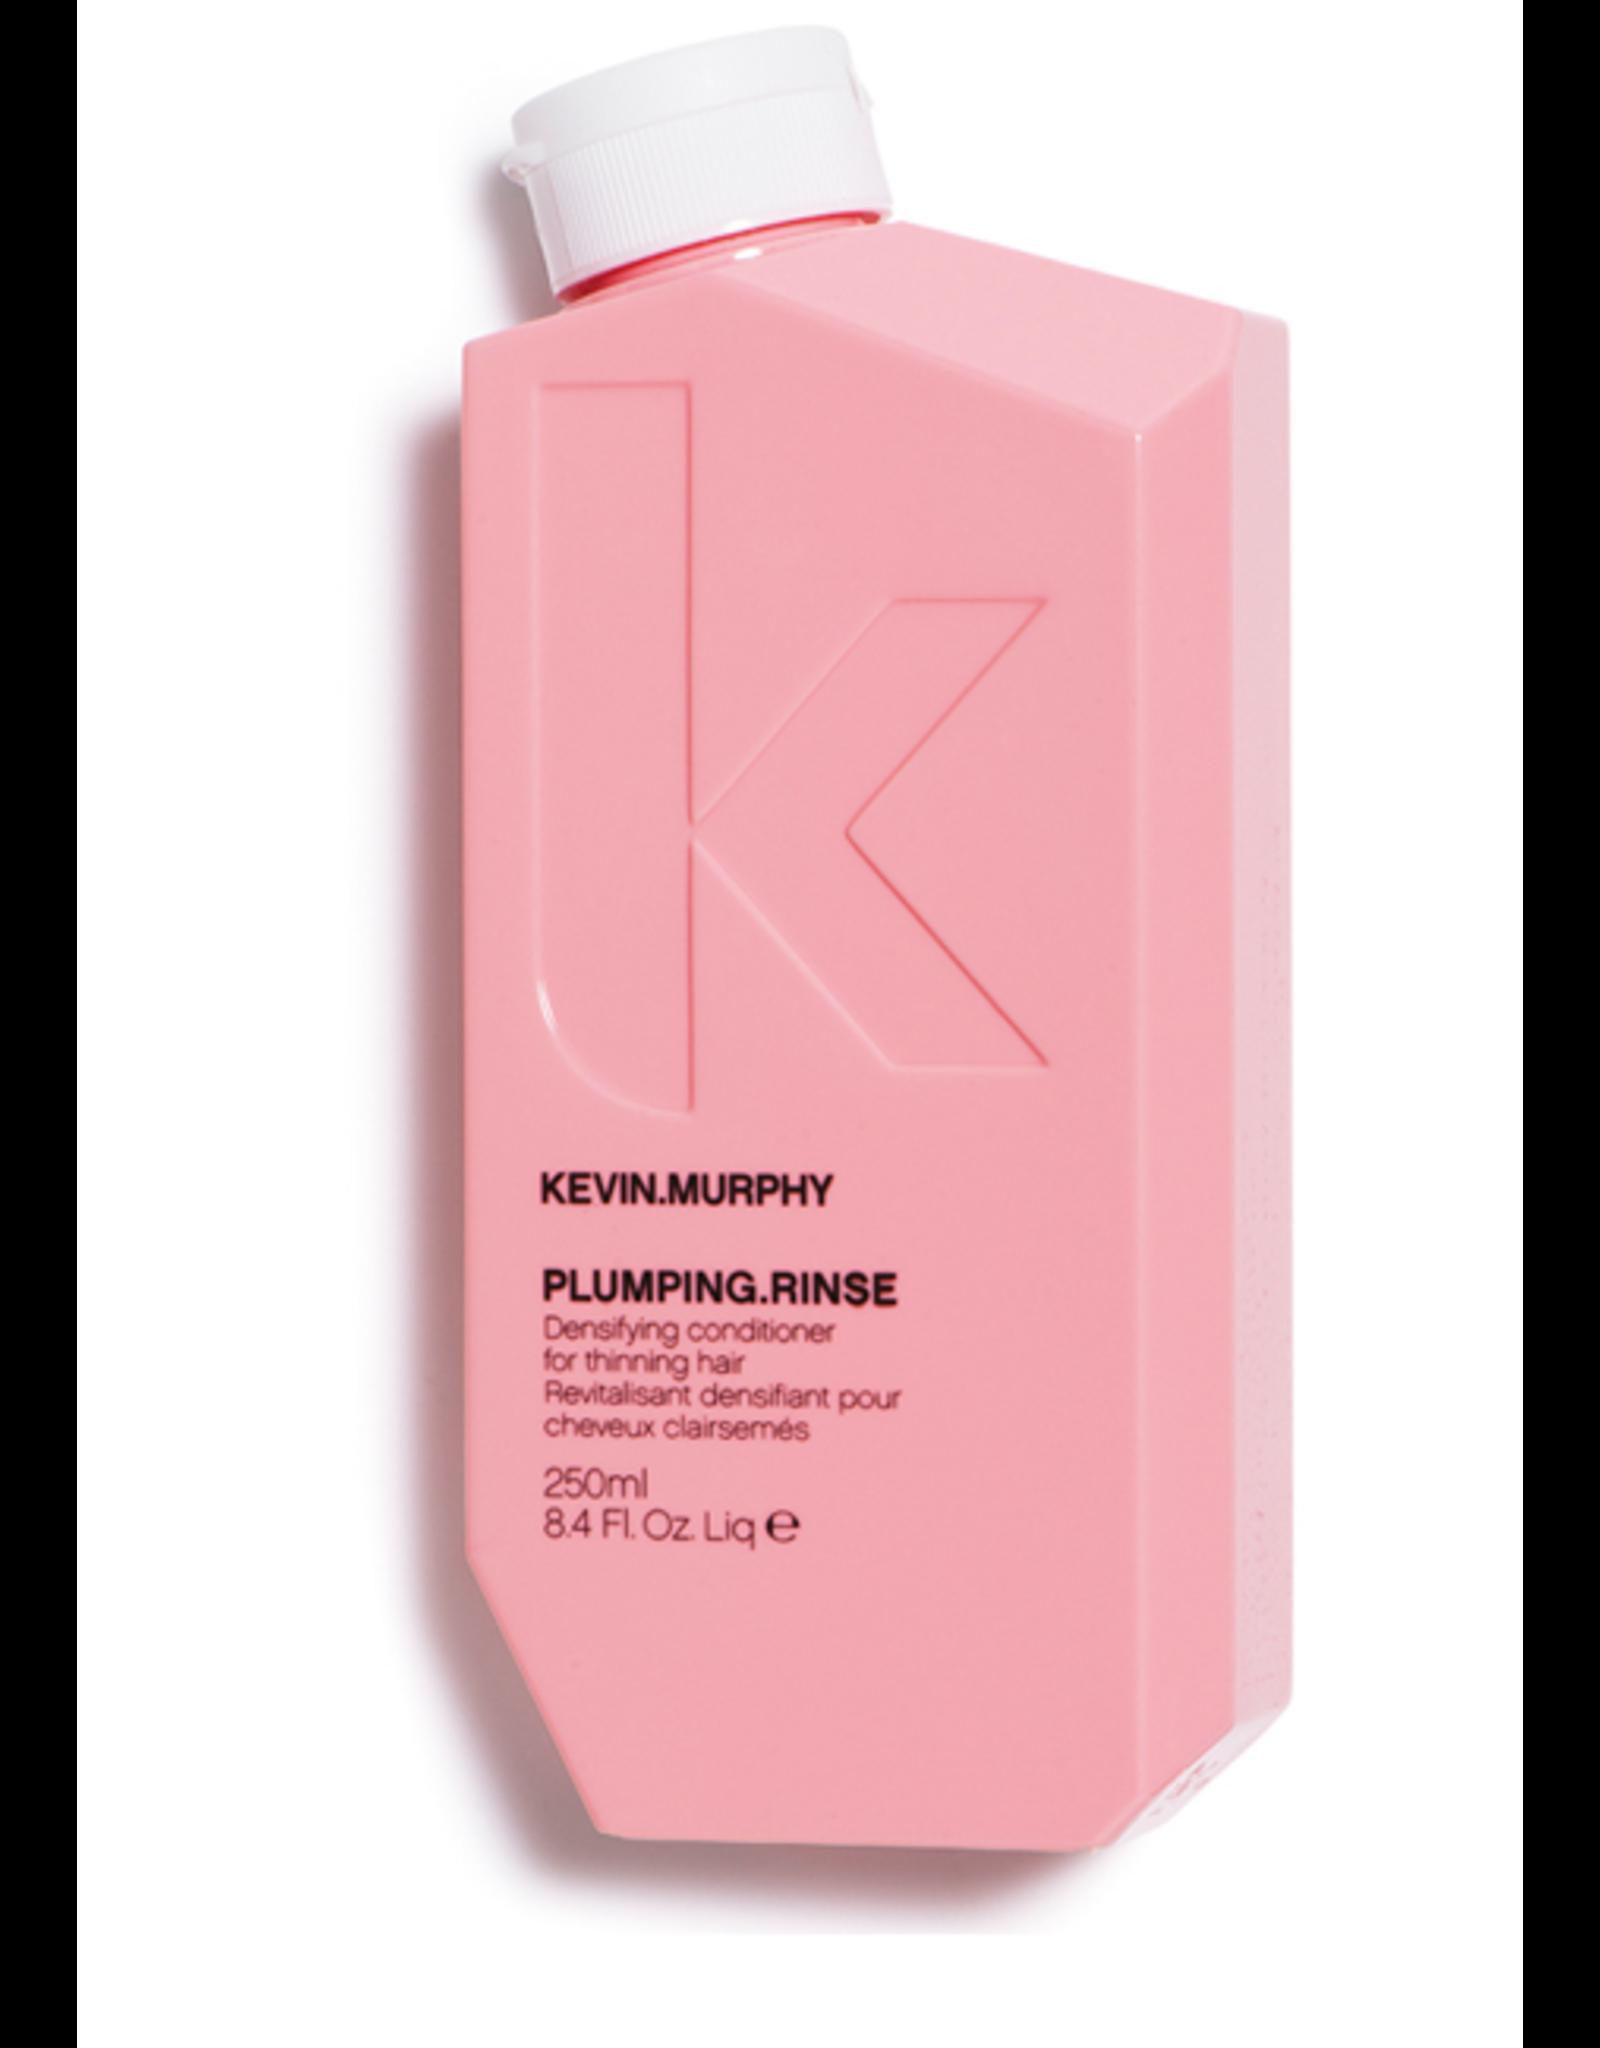 KEVIN.MURPHY Plumping.Rinse (250 ml)